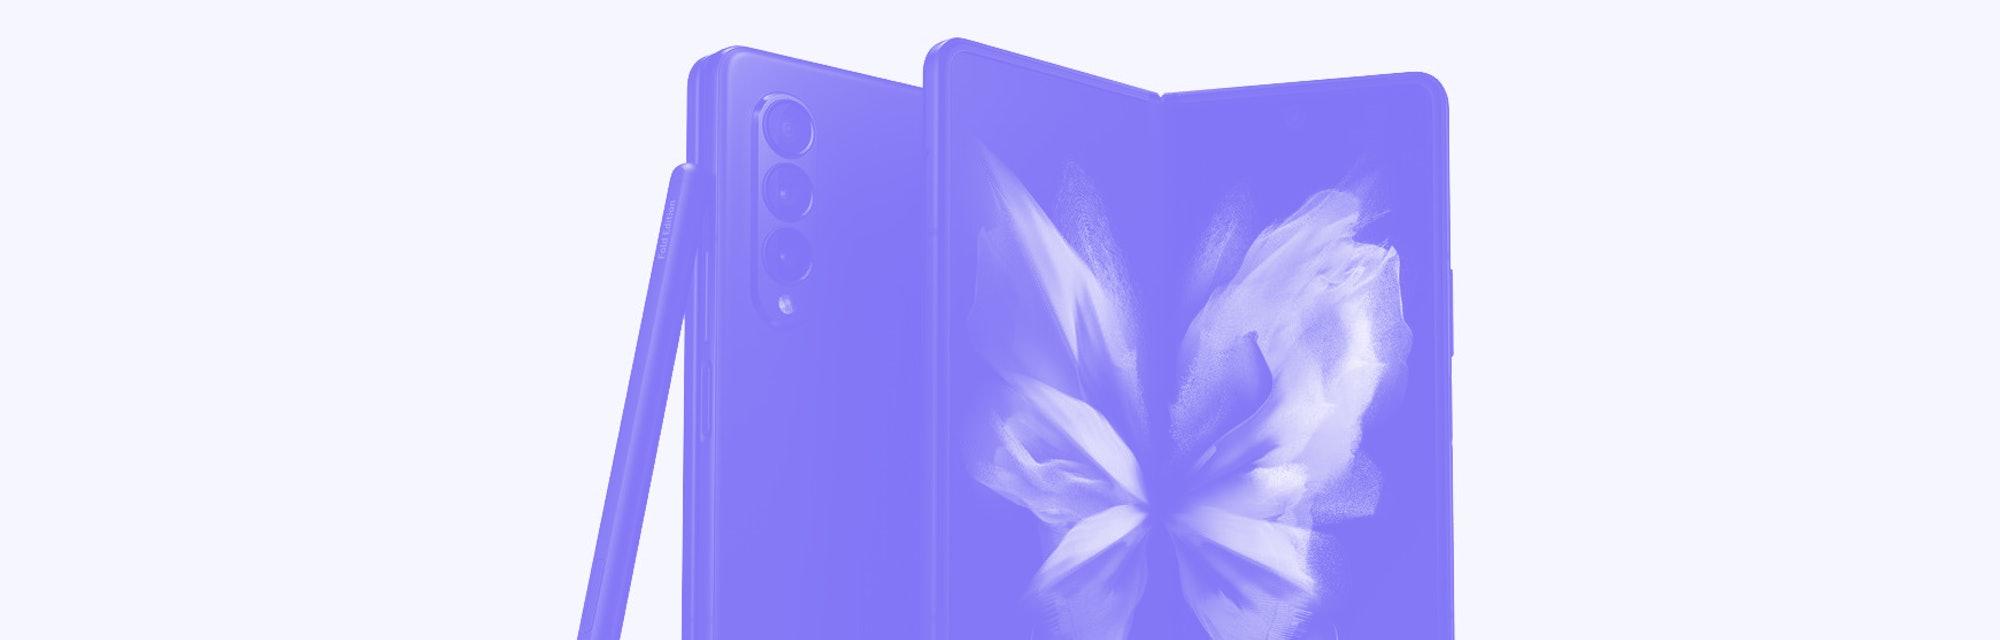 Samsung Galaxy Z Fold 3 foldable smartphone leaked image